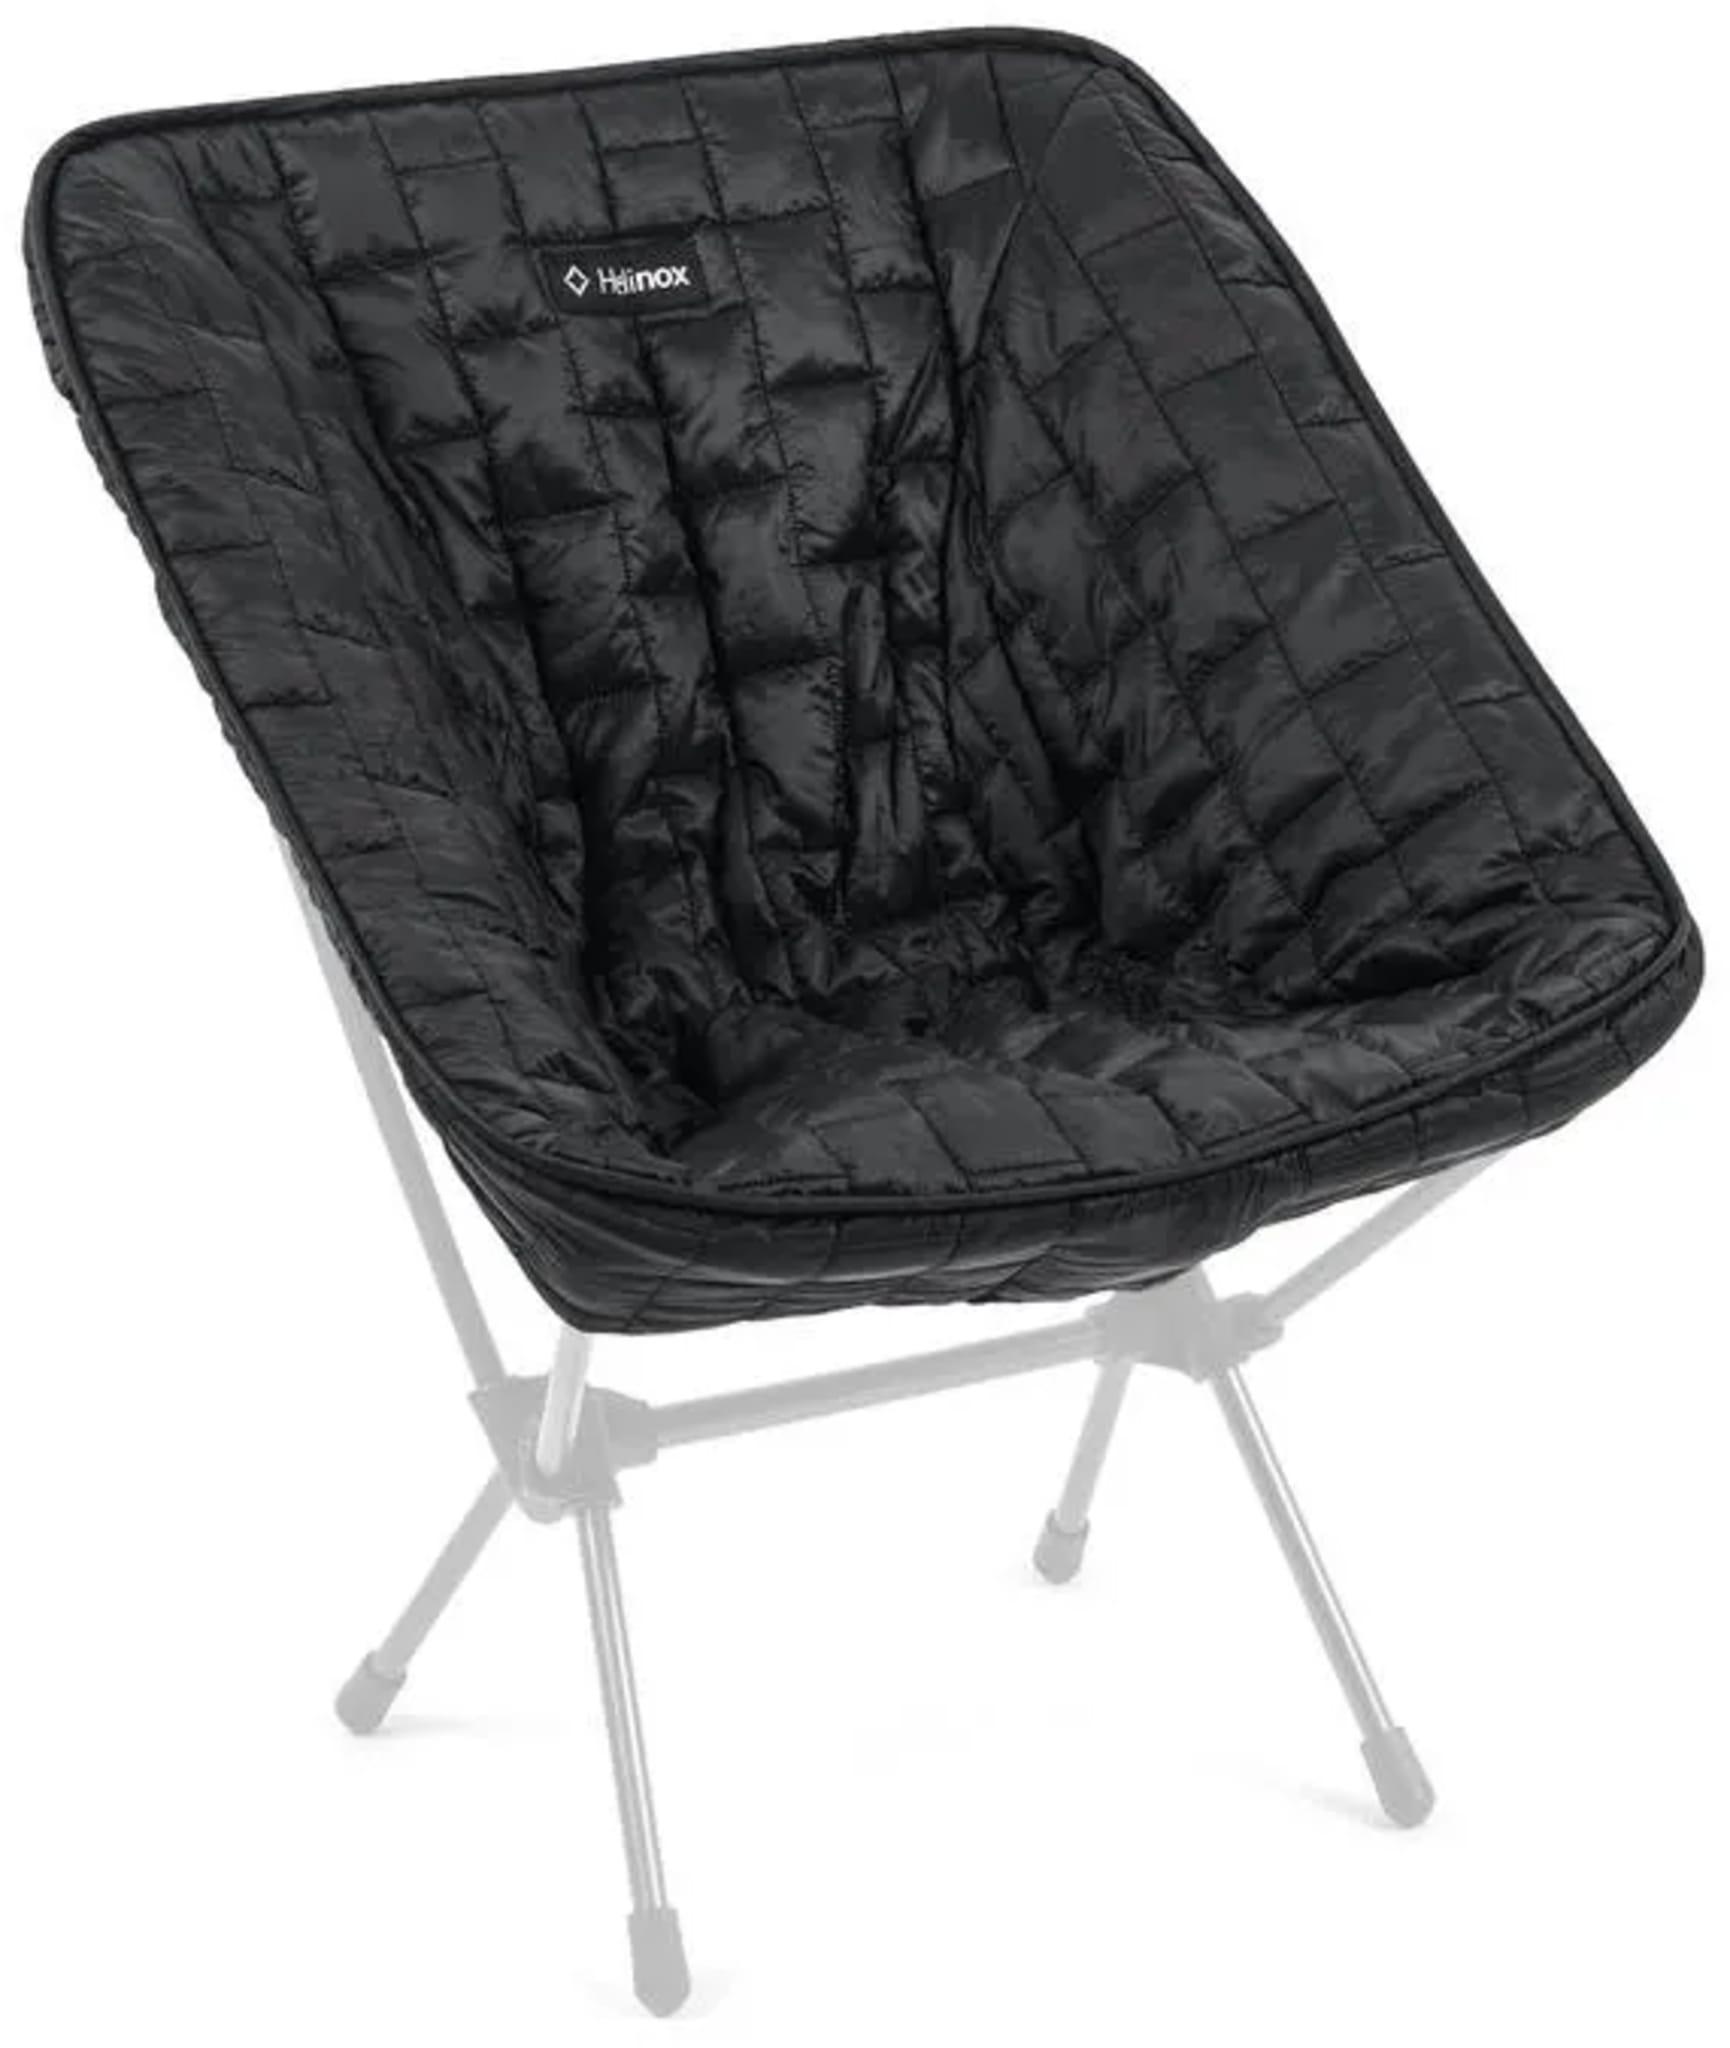 Setevarmer til din Helinox stol